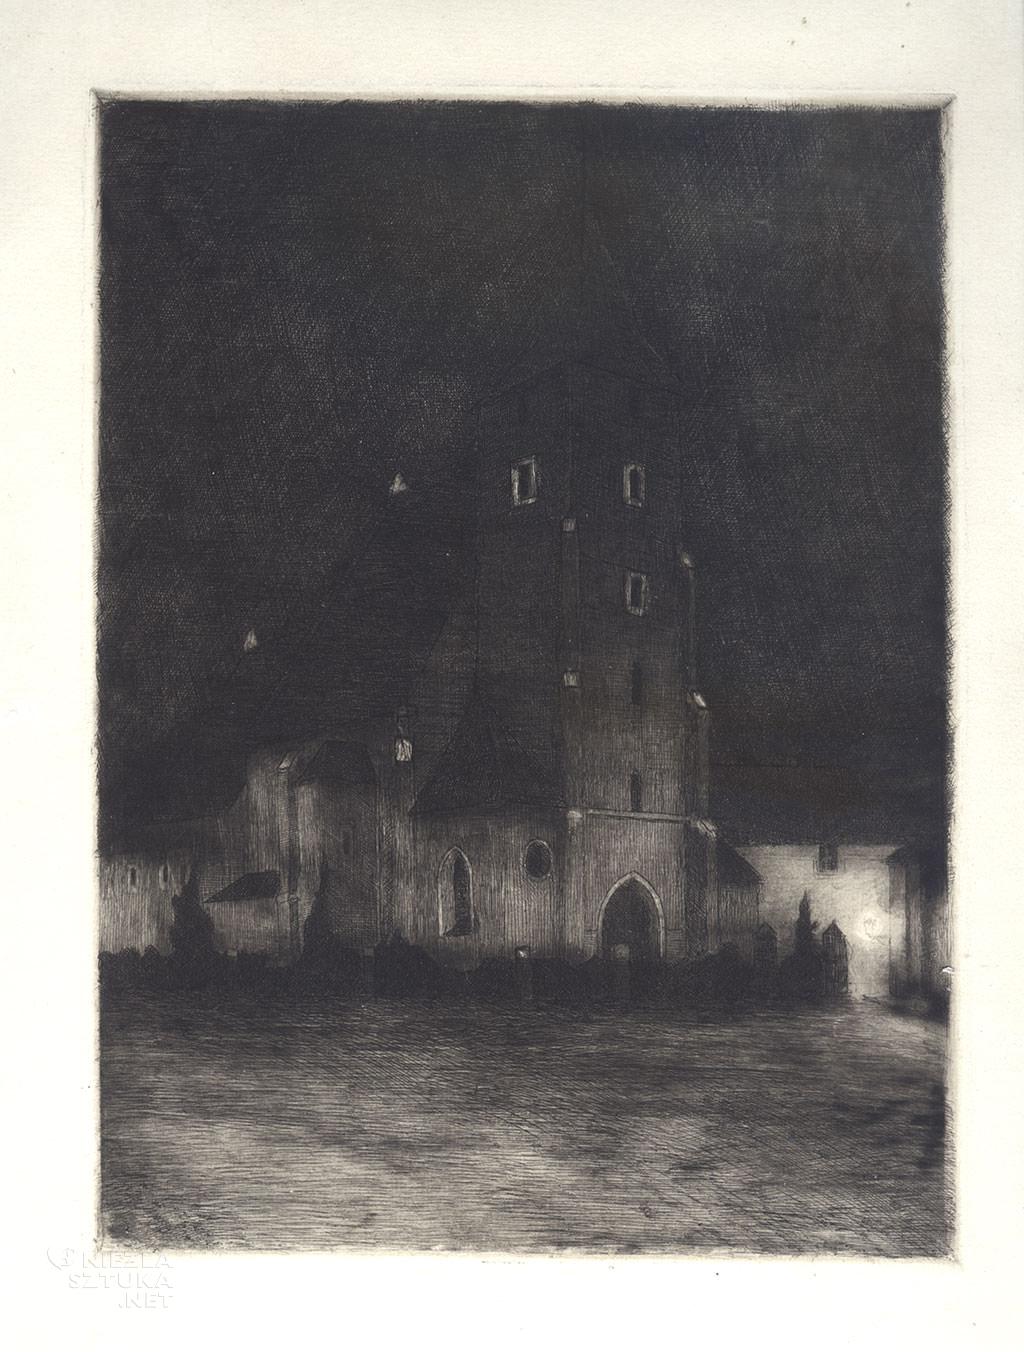 Soter Jaxa-Małachowski, nokturn, Kraków, Niezła sztuka